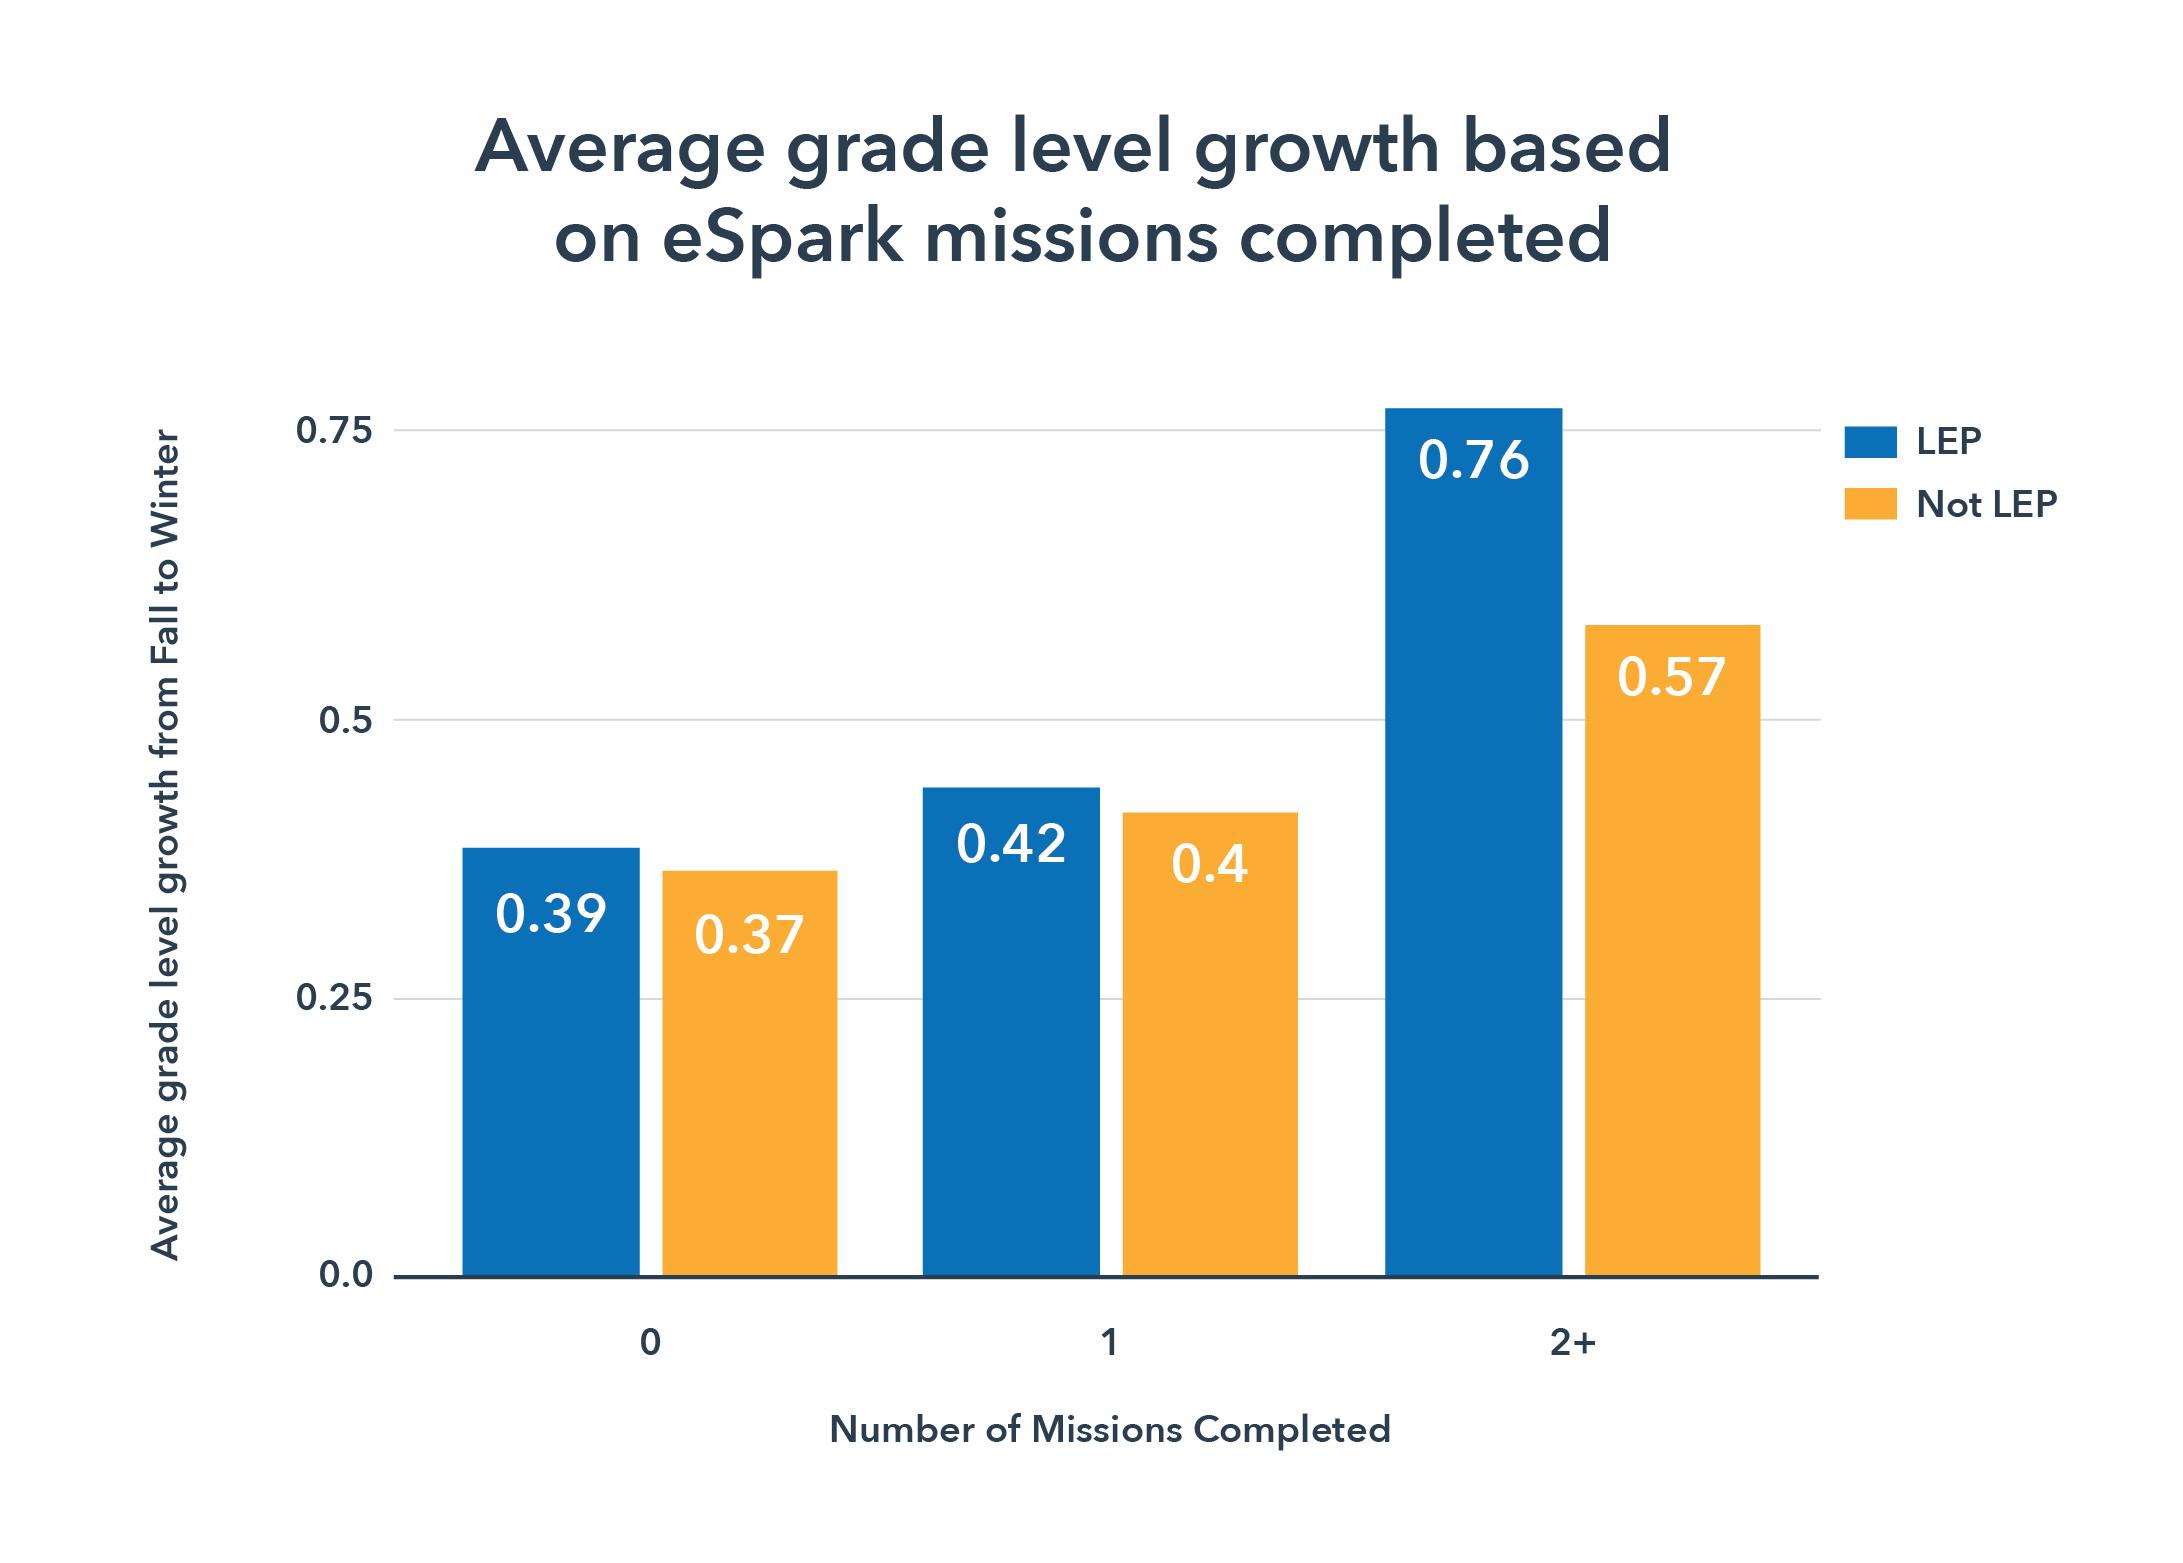 Average Grade Level Growth